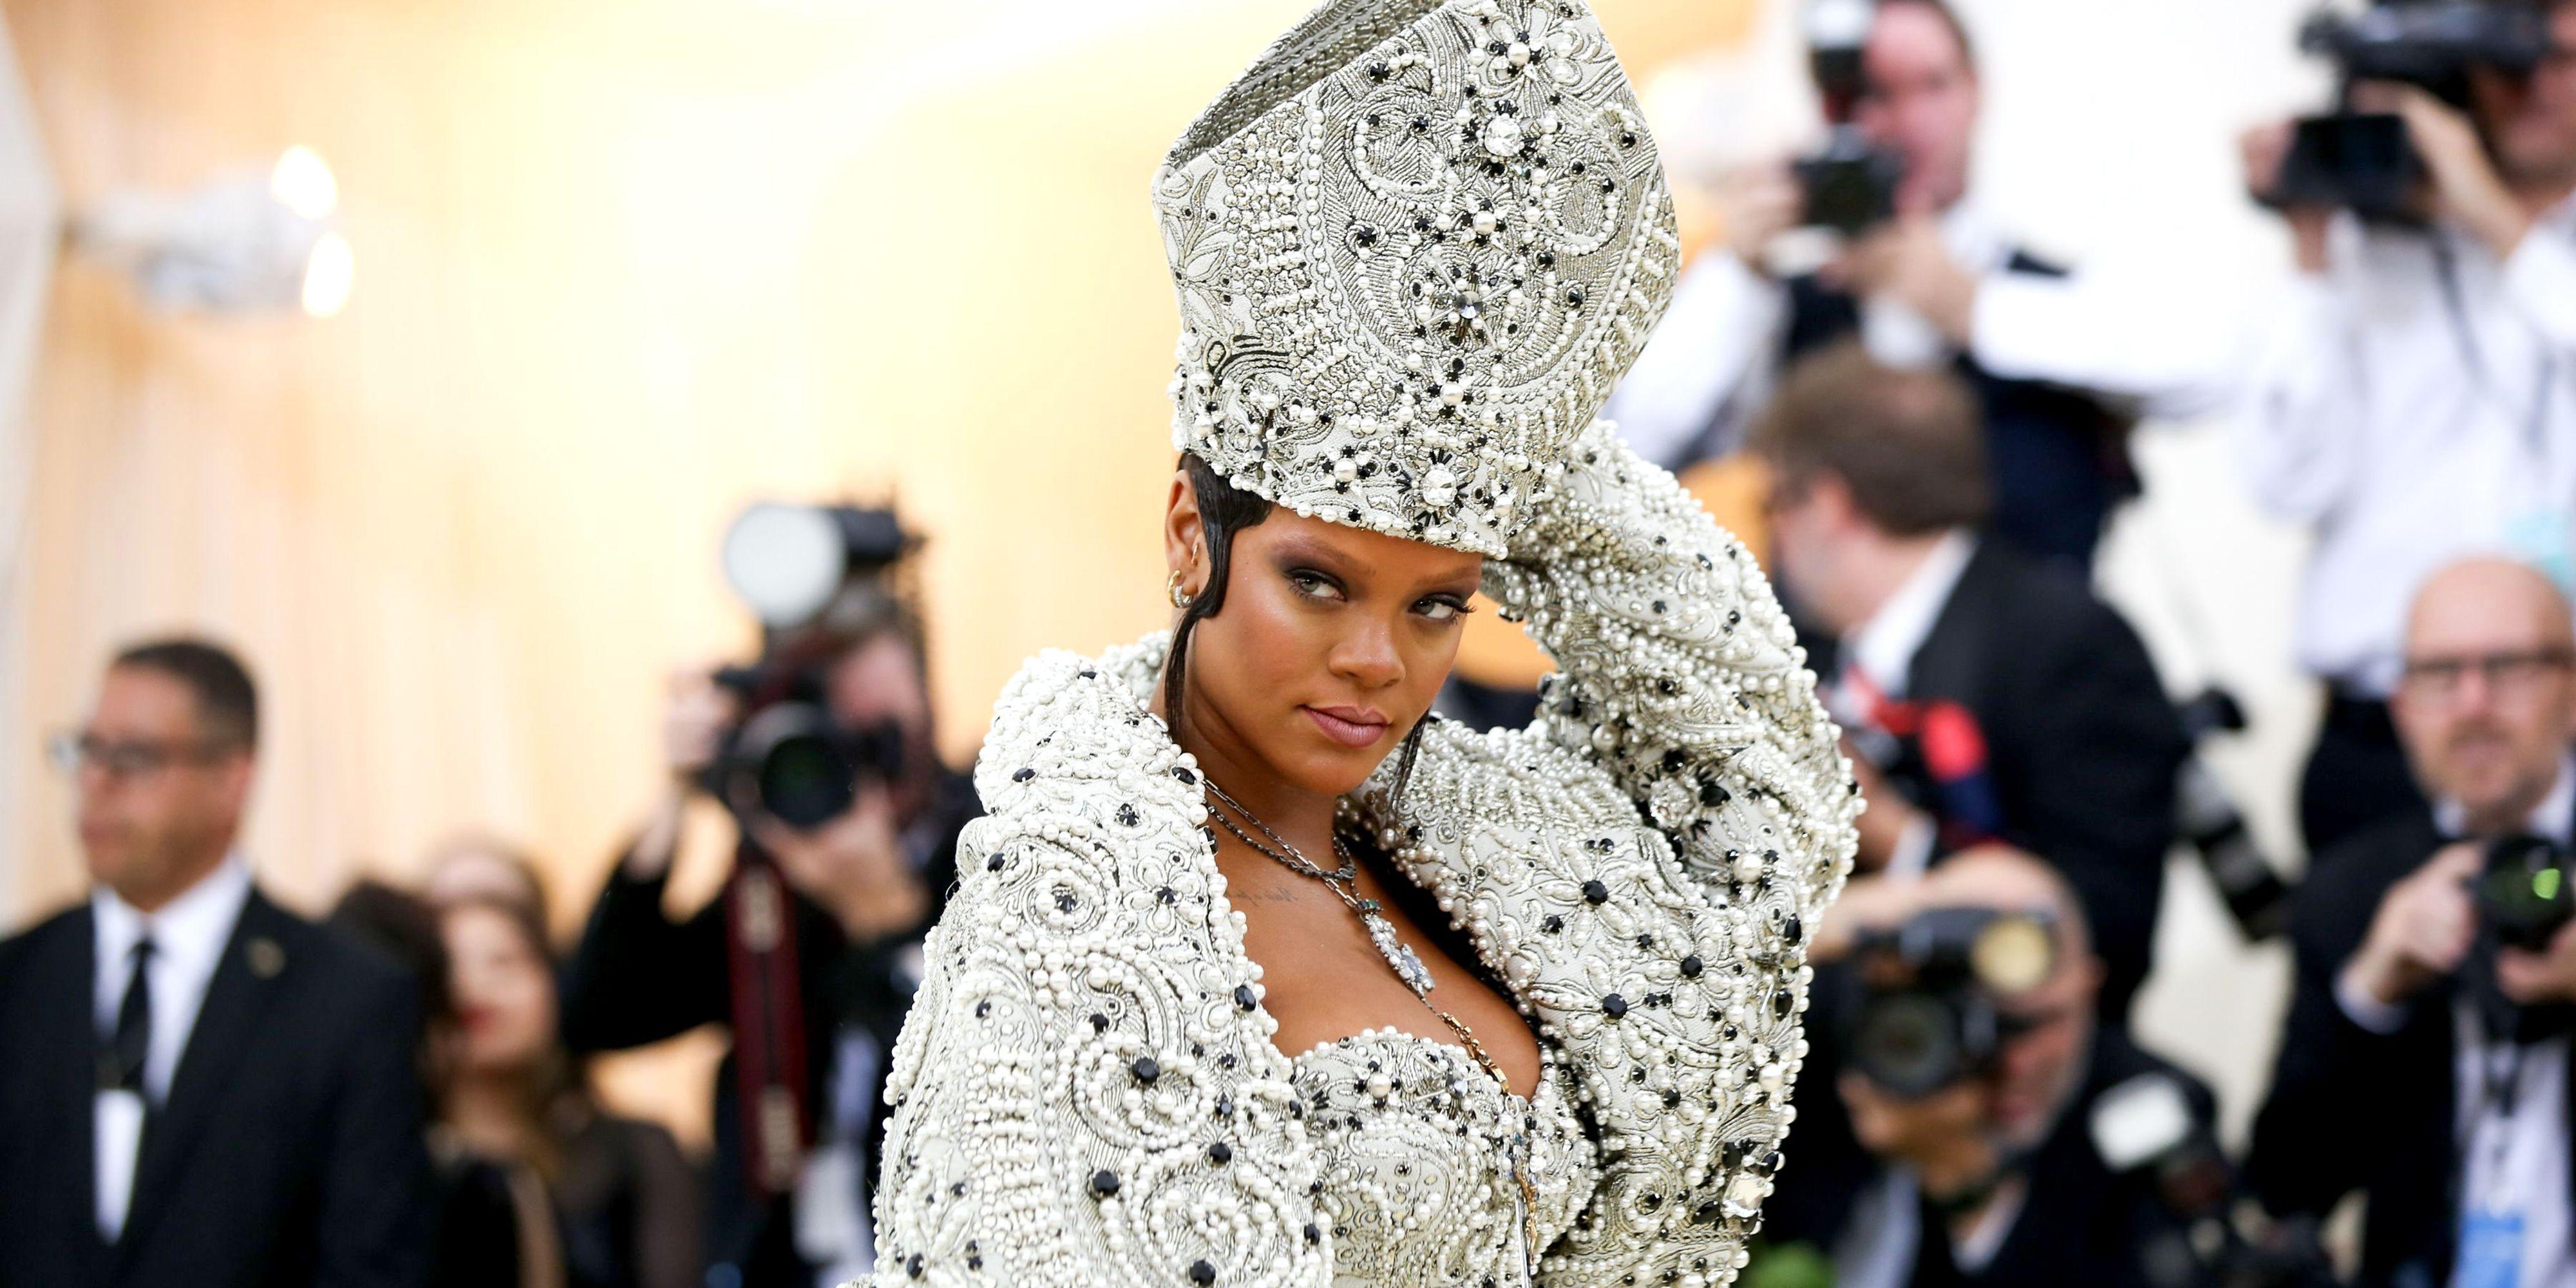 Rihanna MET GALA 2018